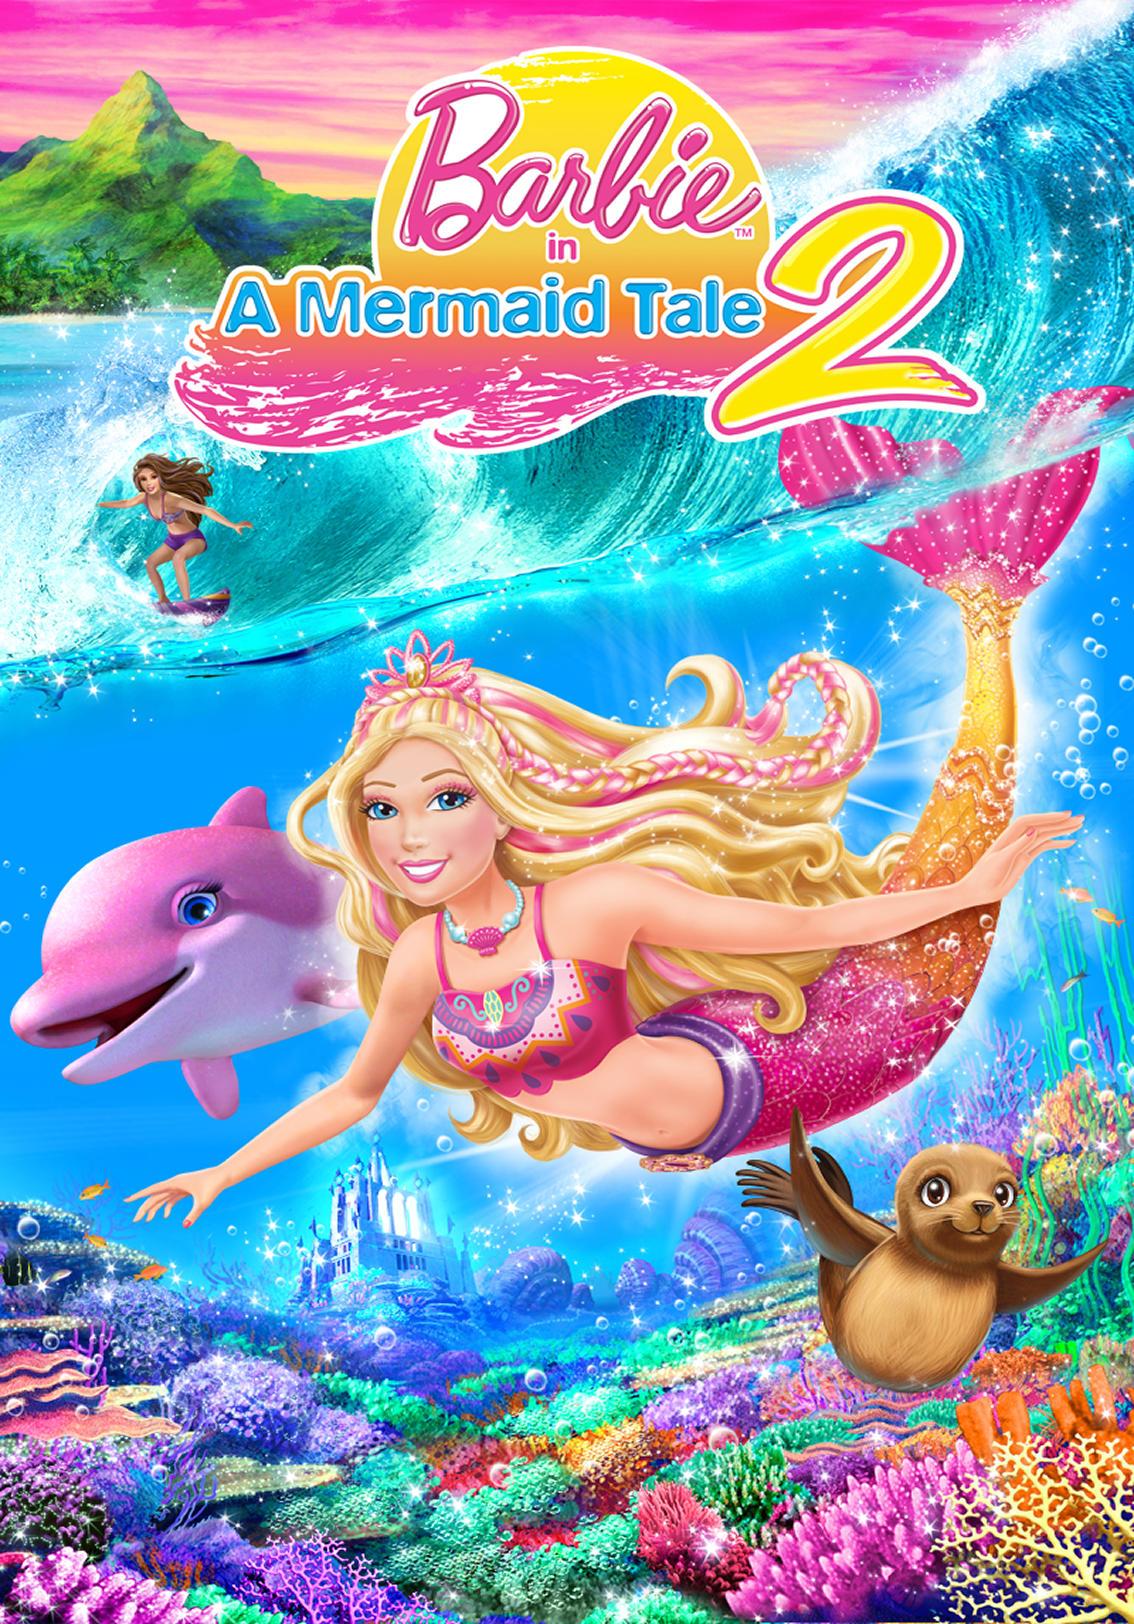 Barbie in a Mermaid Tale 2 (2012) | Kaleidescape Movie Store